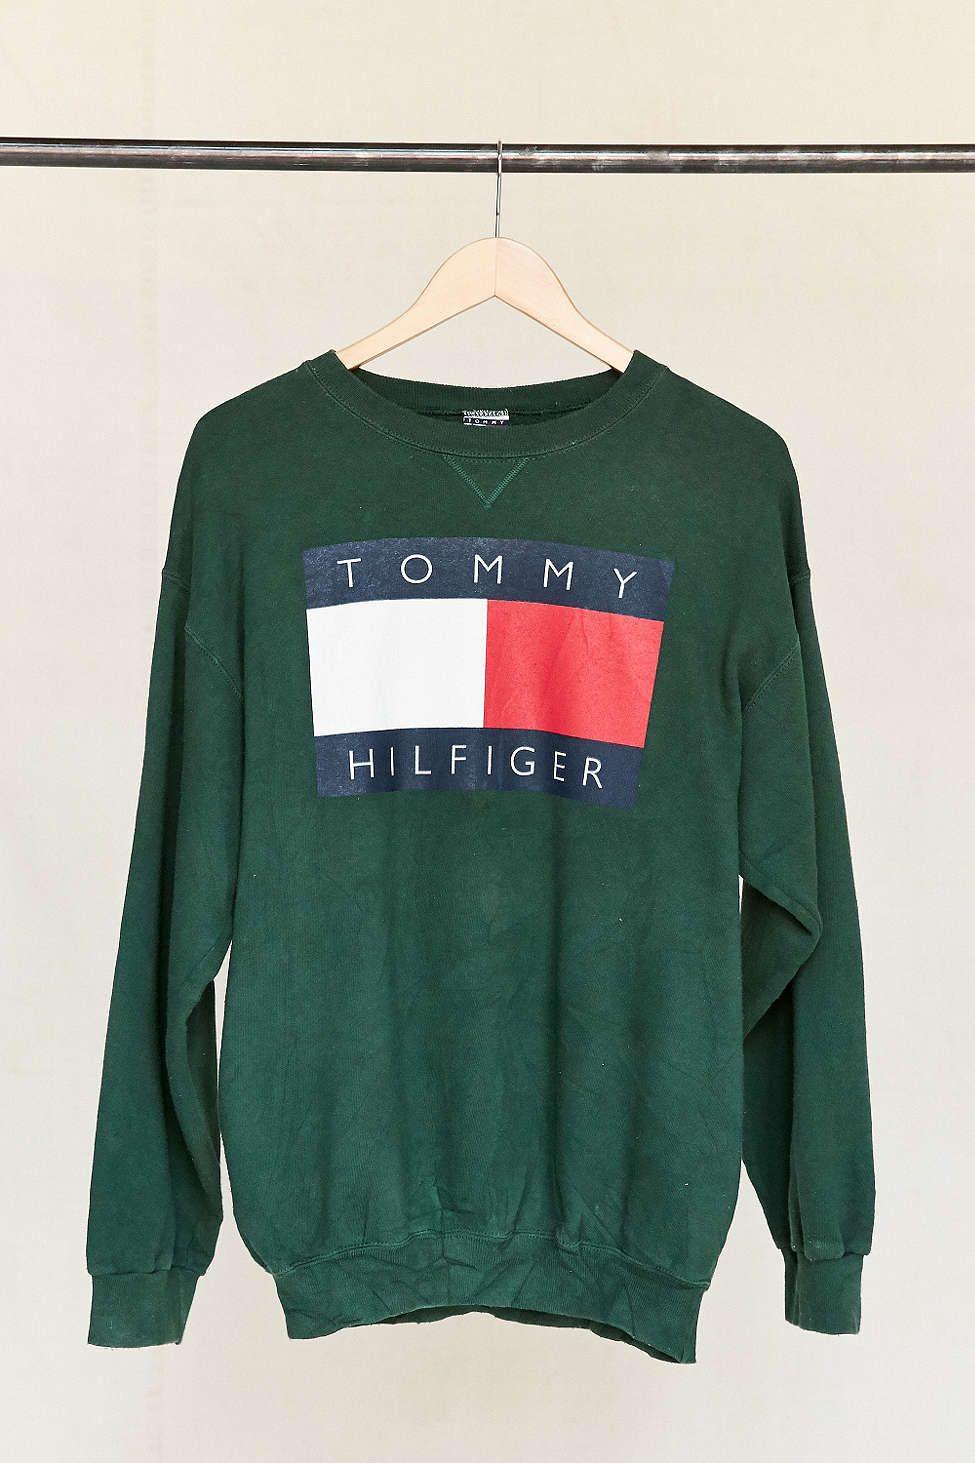 Vintage Tommy Hilfiger 90s Sweatshirt